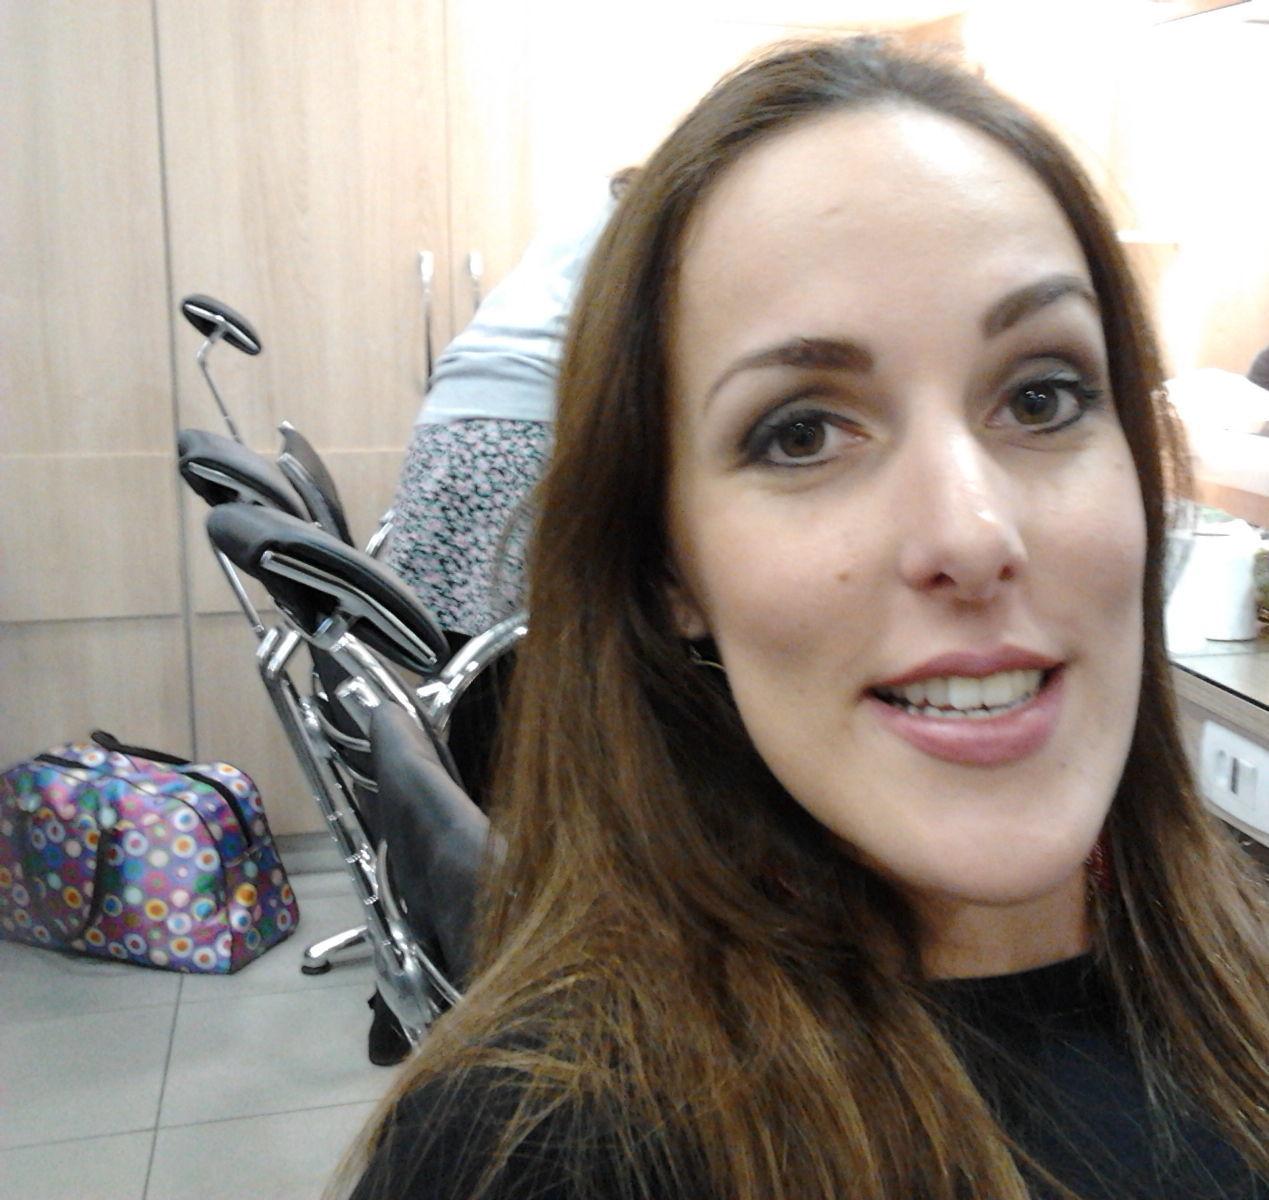 Maquiagem02 maquiador(a) consultor(a) de estetica